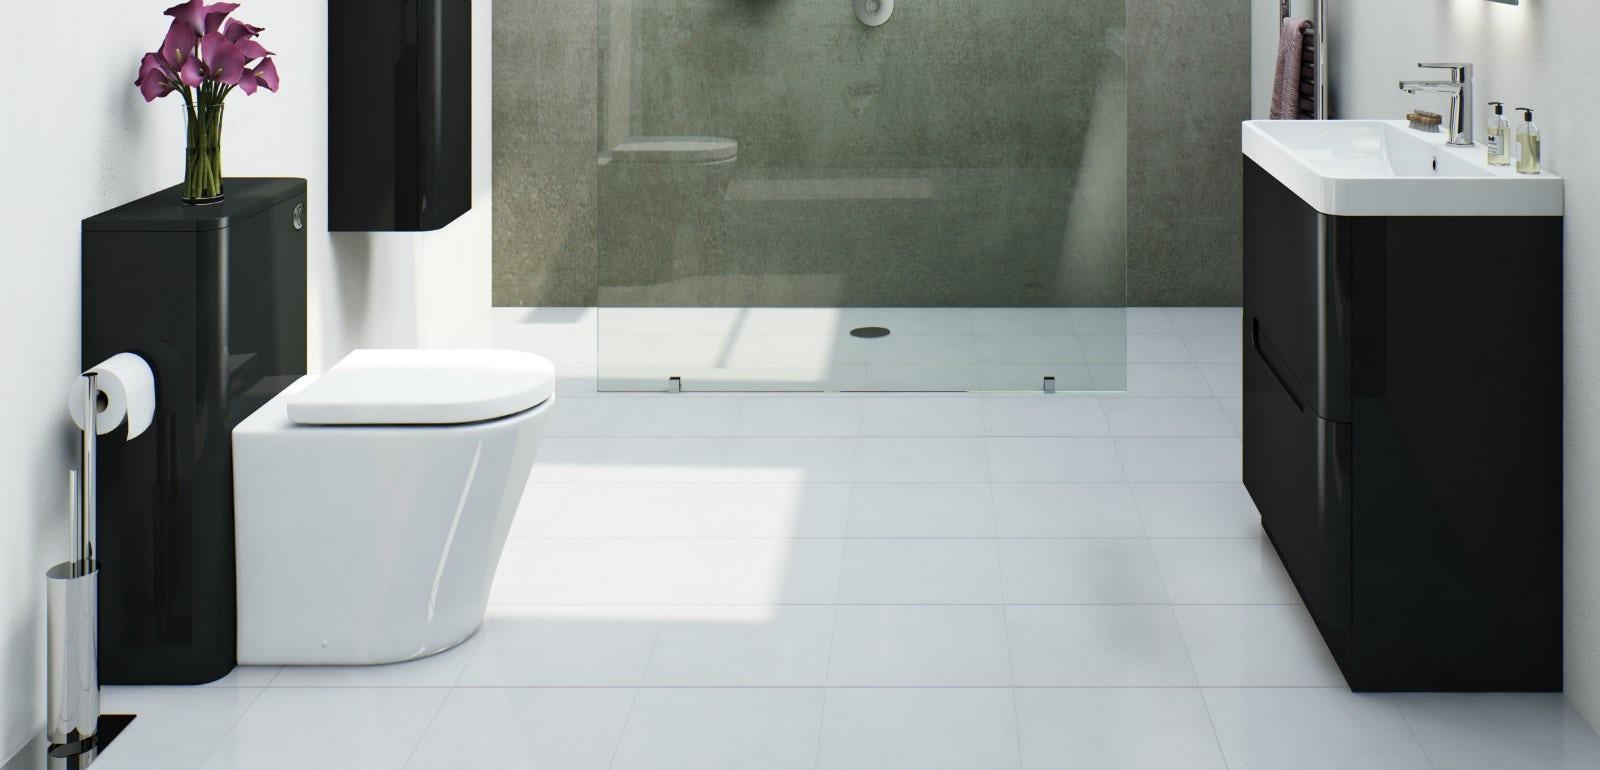 8 reasons why a monochrome bathrooms work | VictoriaPlum.com on Monochromatic Bathroom Ideas  id=15084